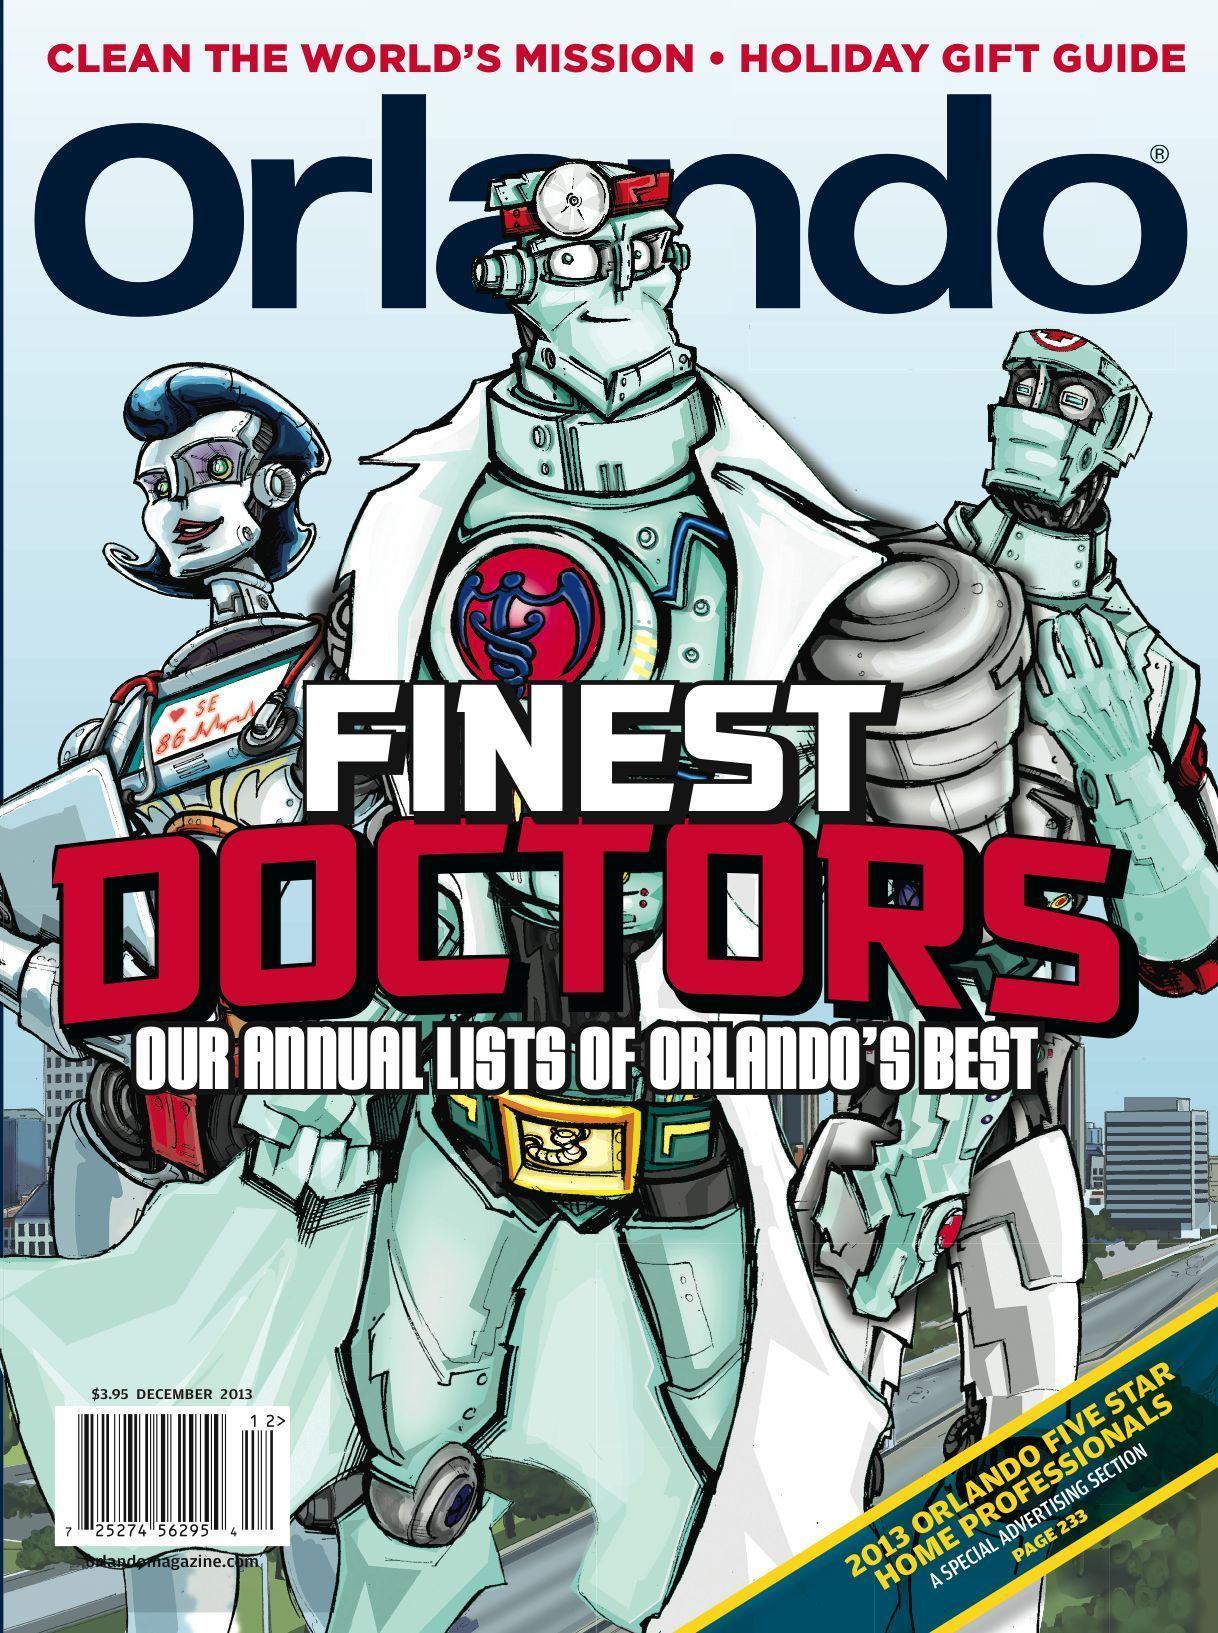 Orlando Finest Doctors